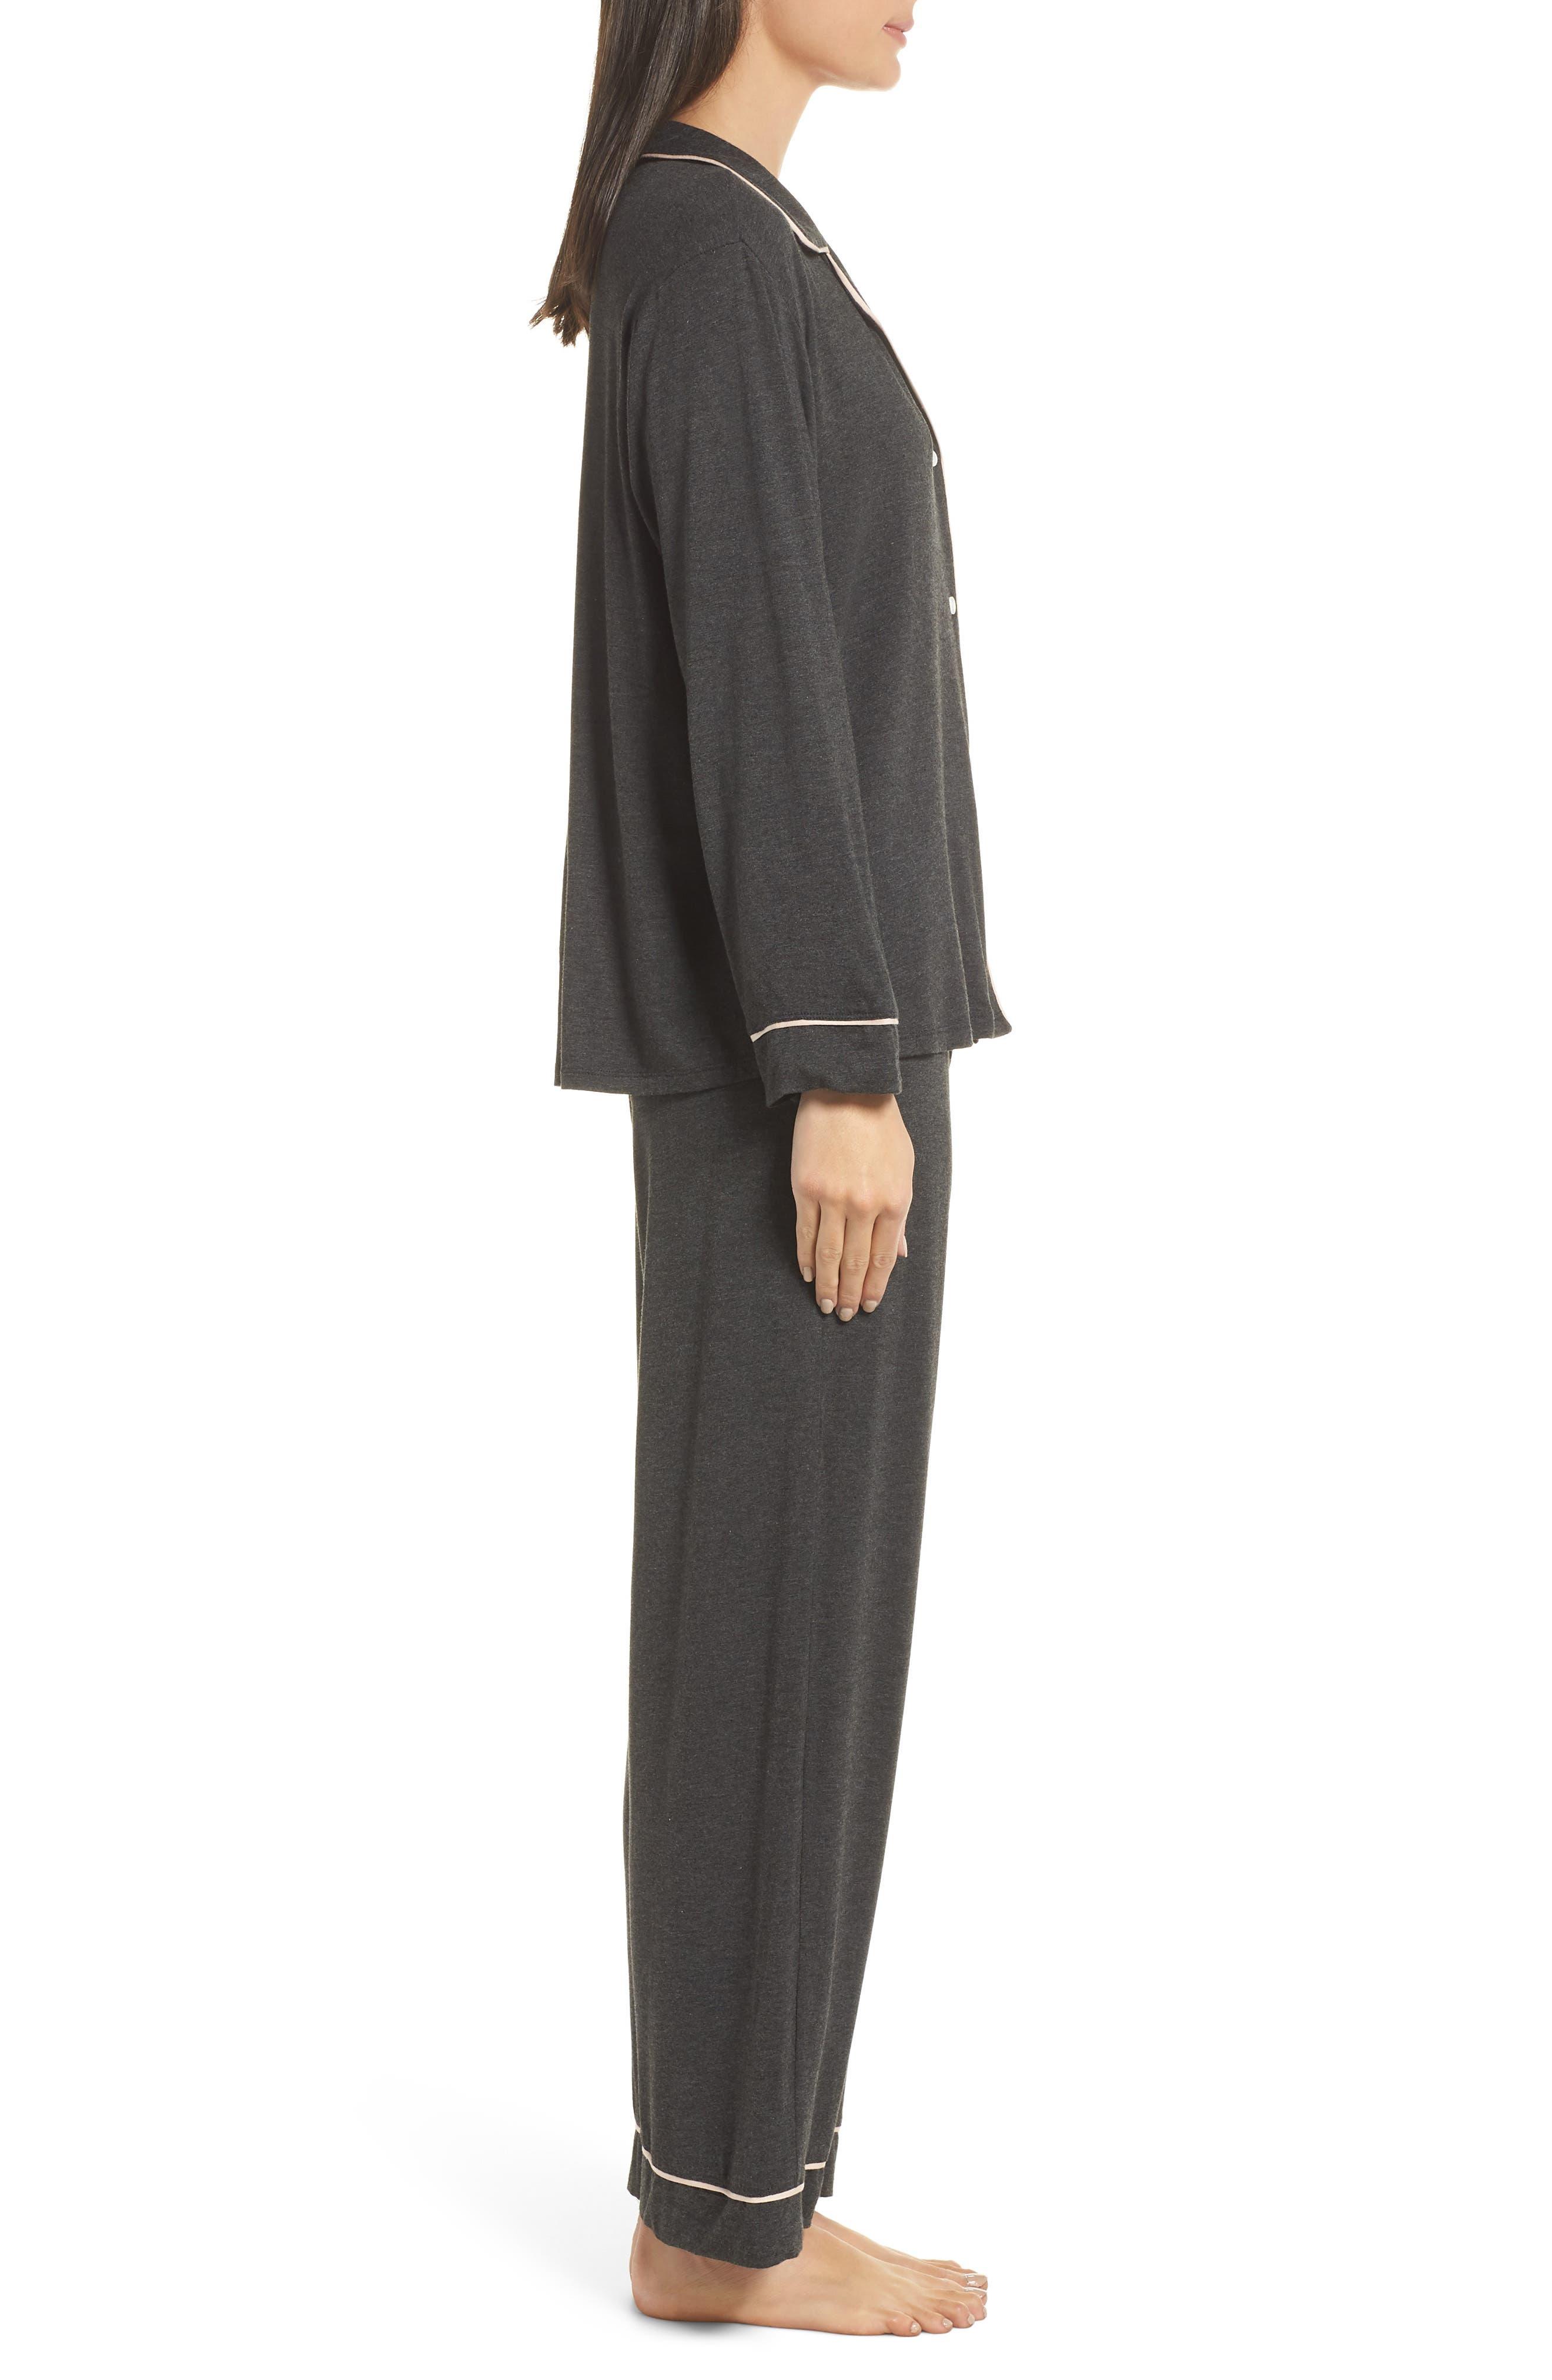 Gisele Pajamas,                             Alternate thumbnail 3, color,                             CHARCOAL/ BELLINI